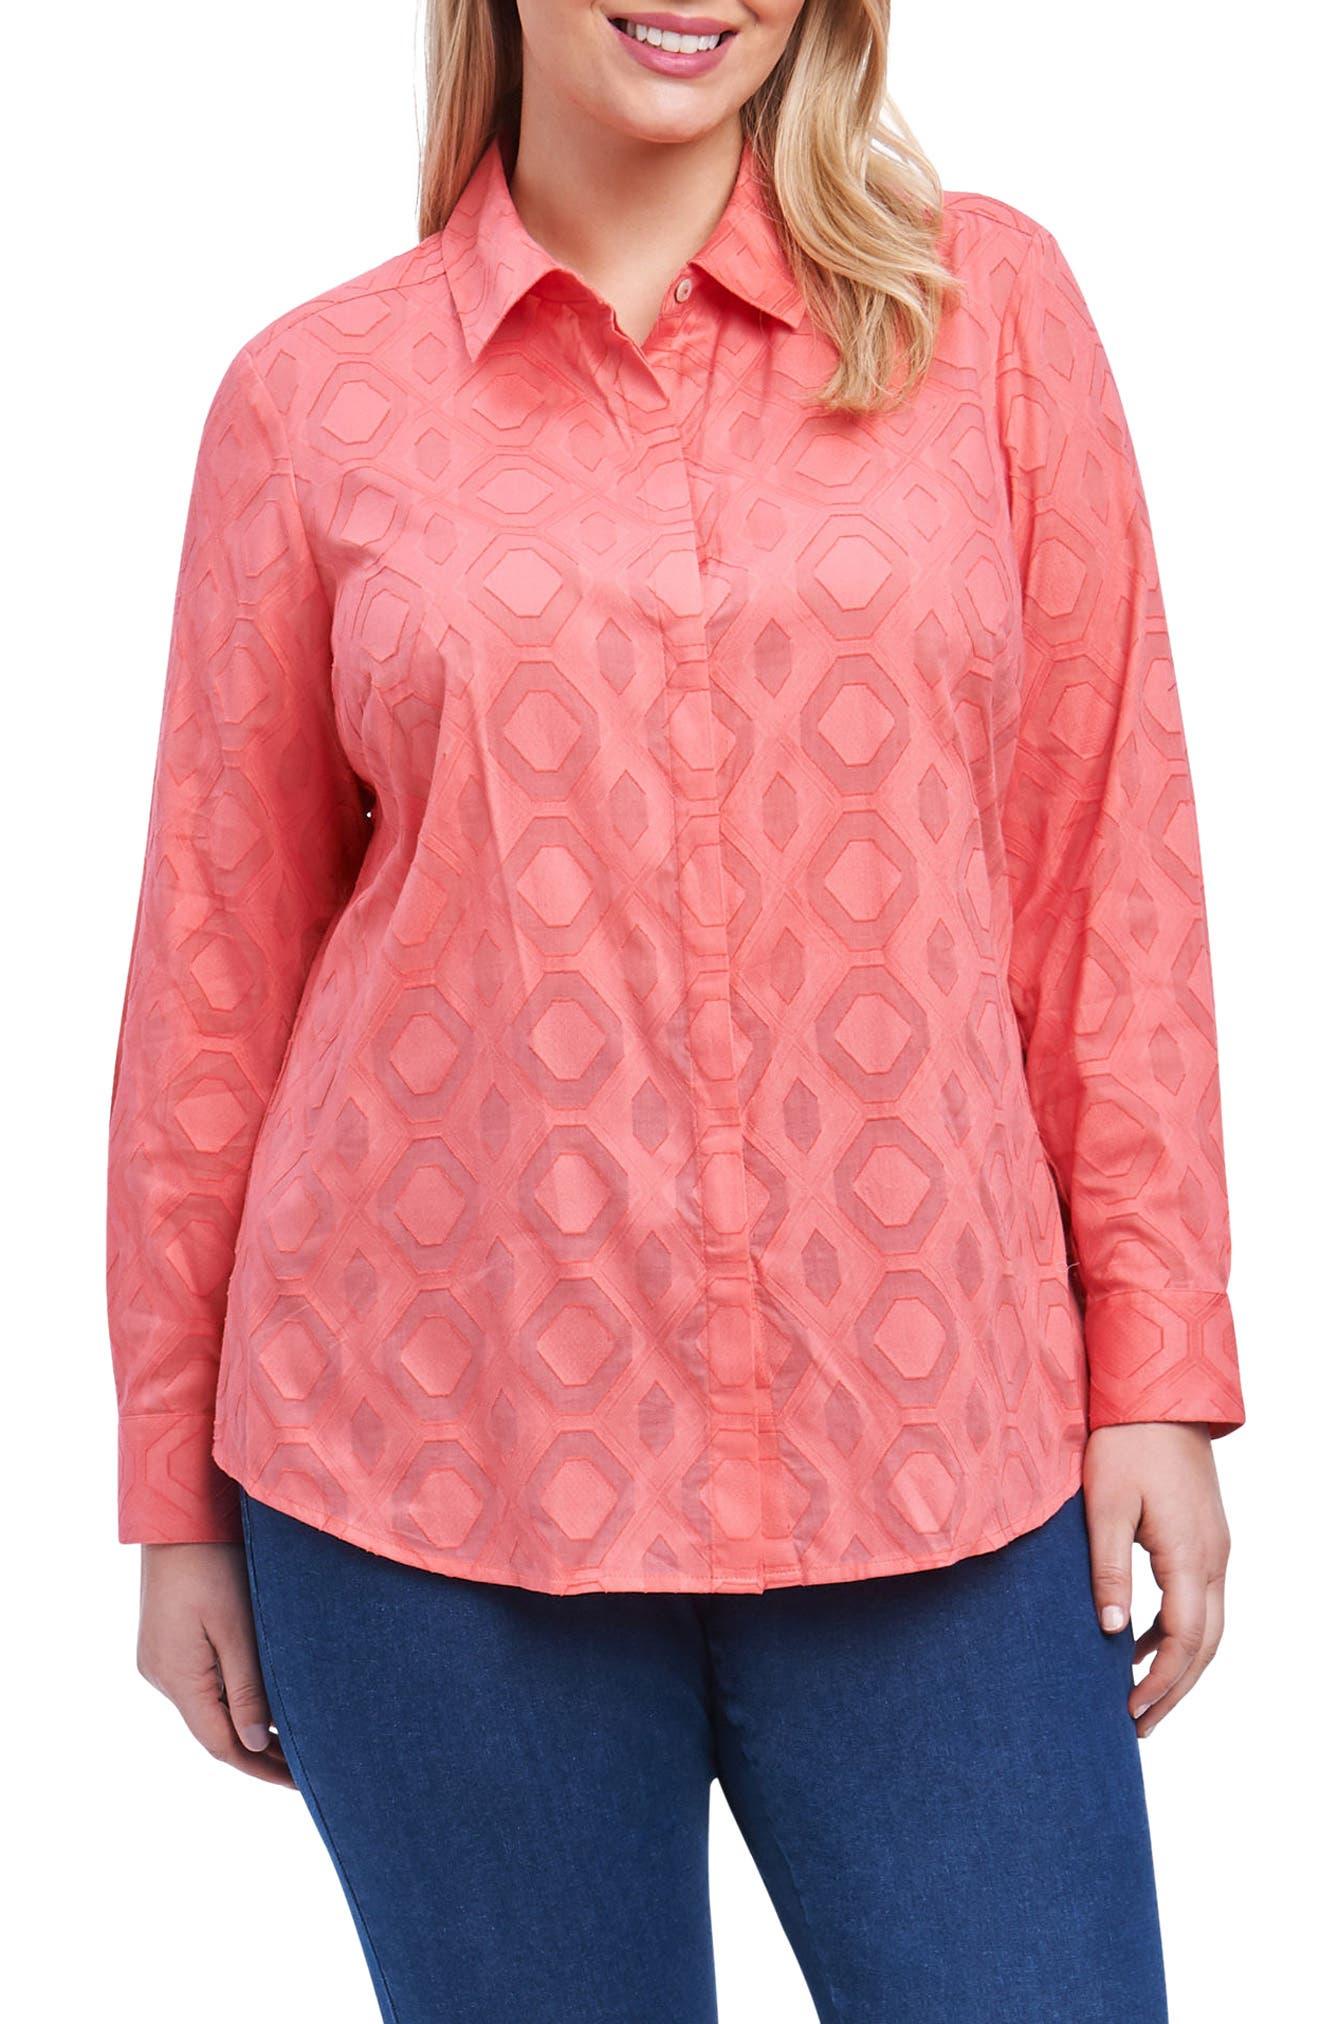 Ava Diamond Clip Jacquard Shirt,                             Main thumbnail 1, color,                             SUNSET CORAL